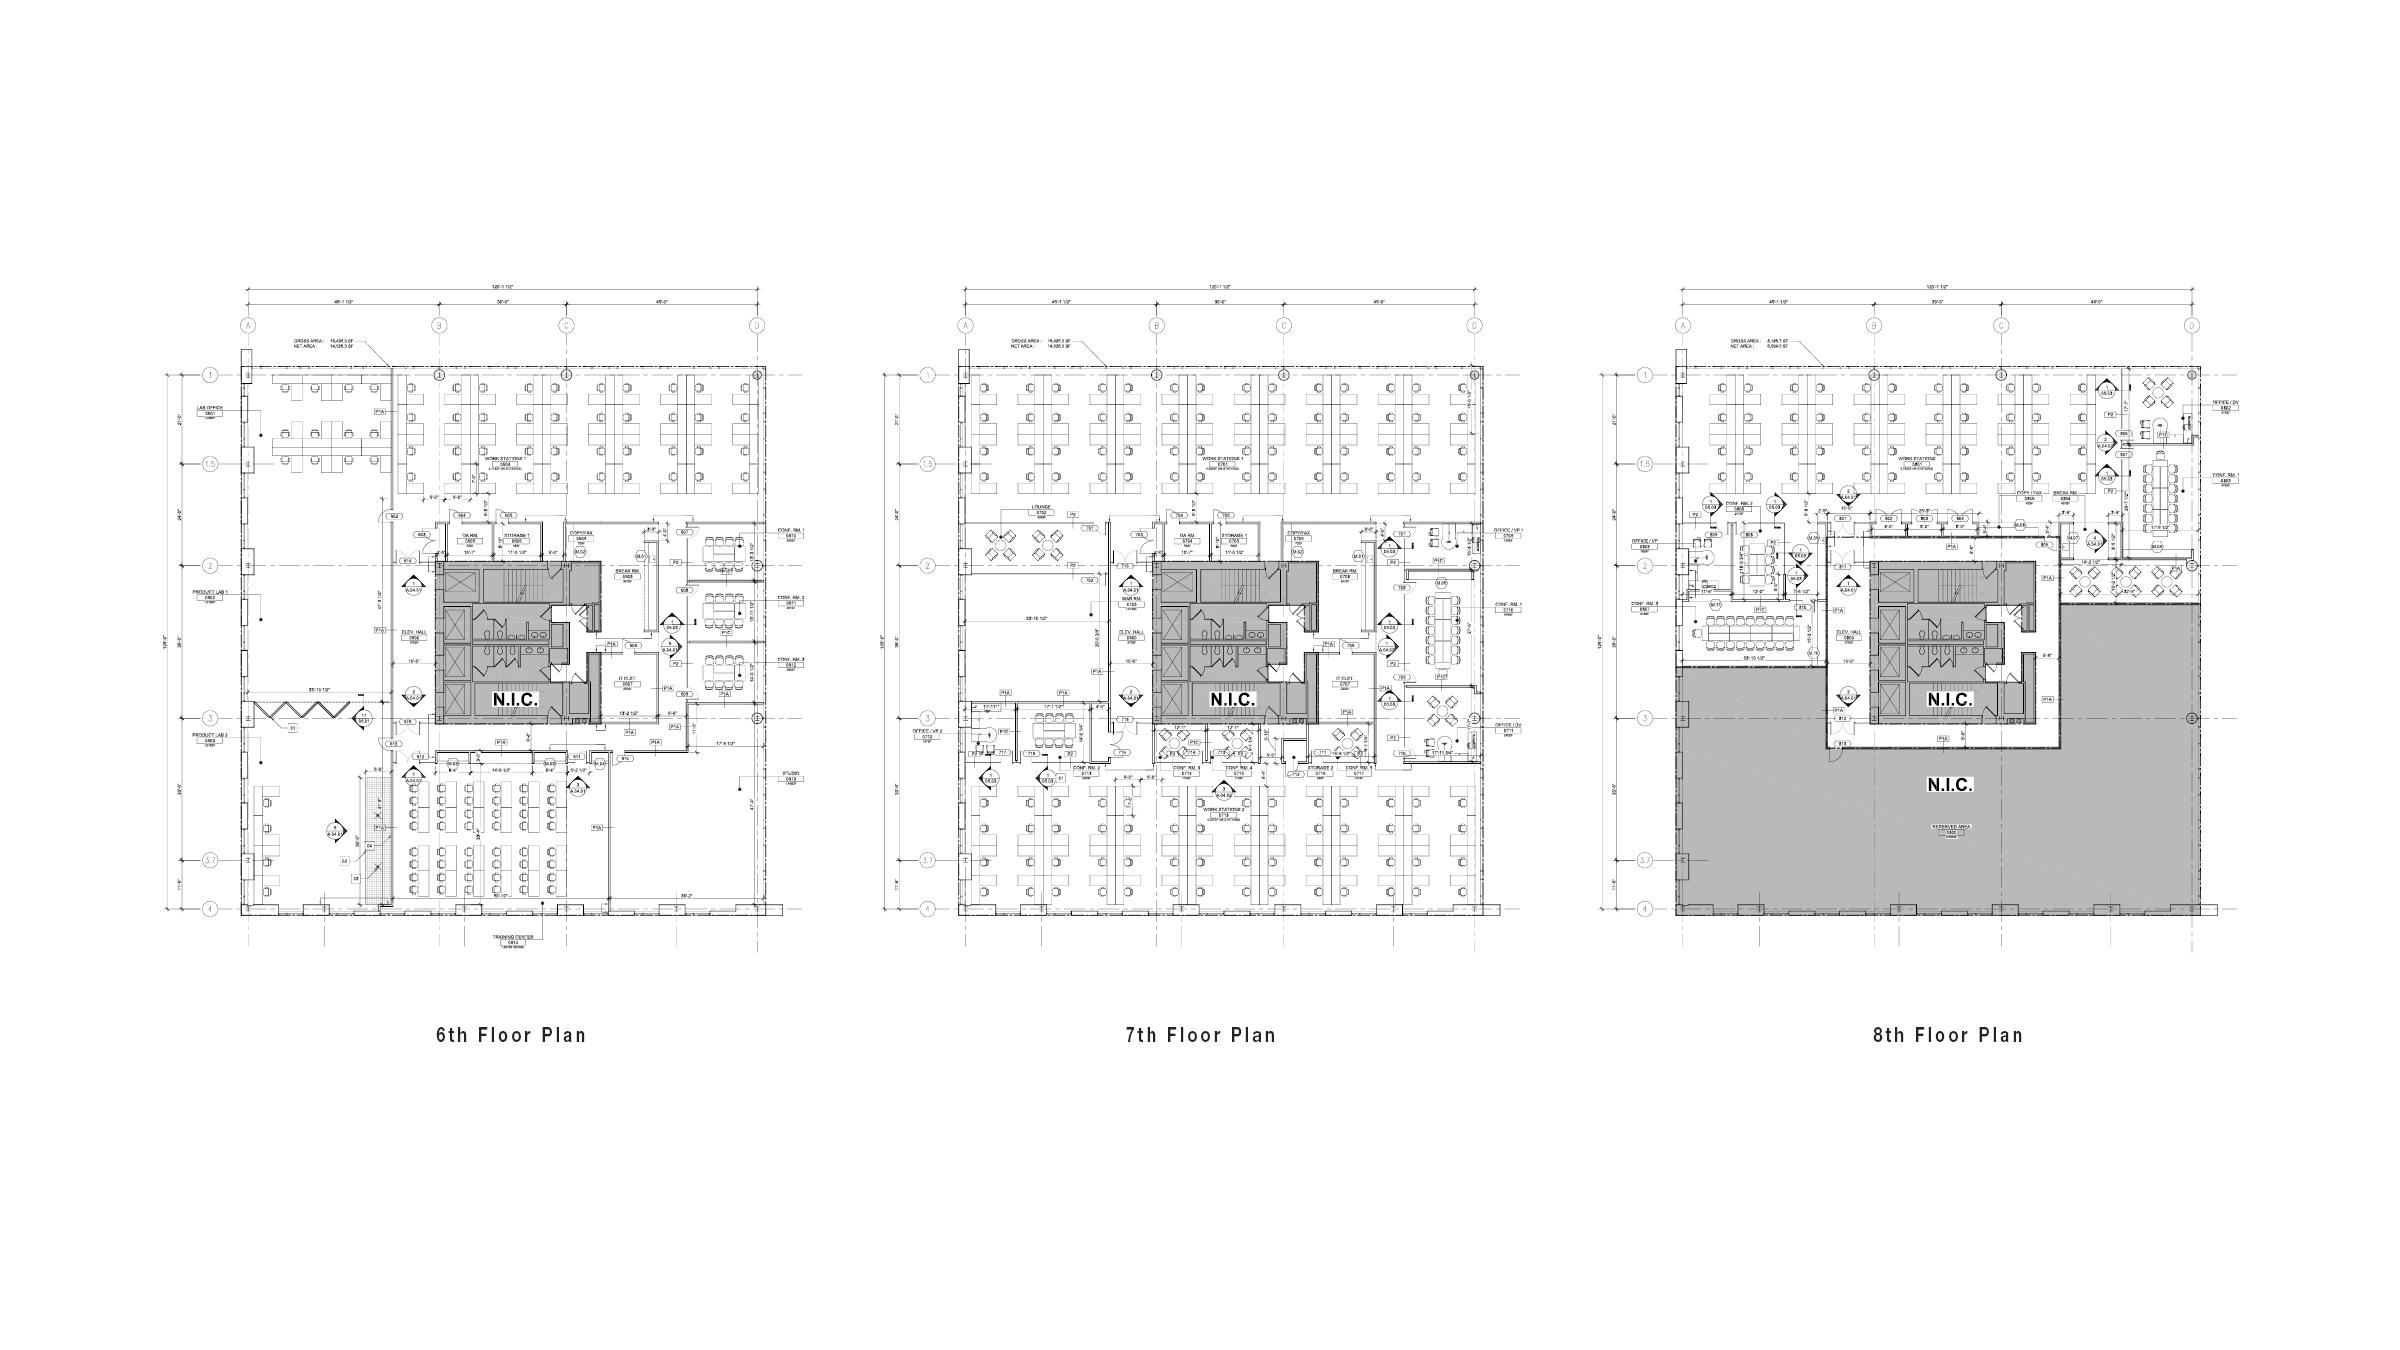 Pioli_Eye Level Building18.png